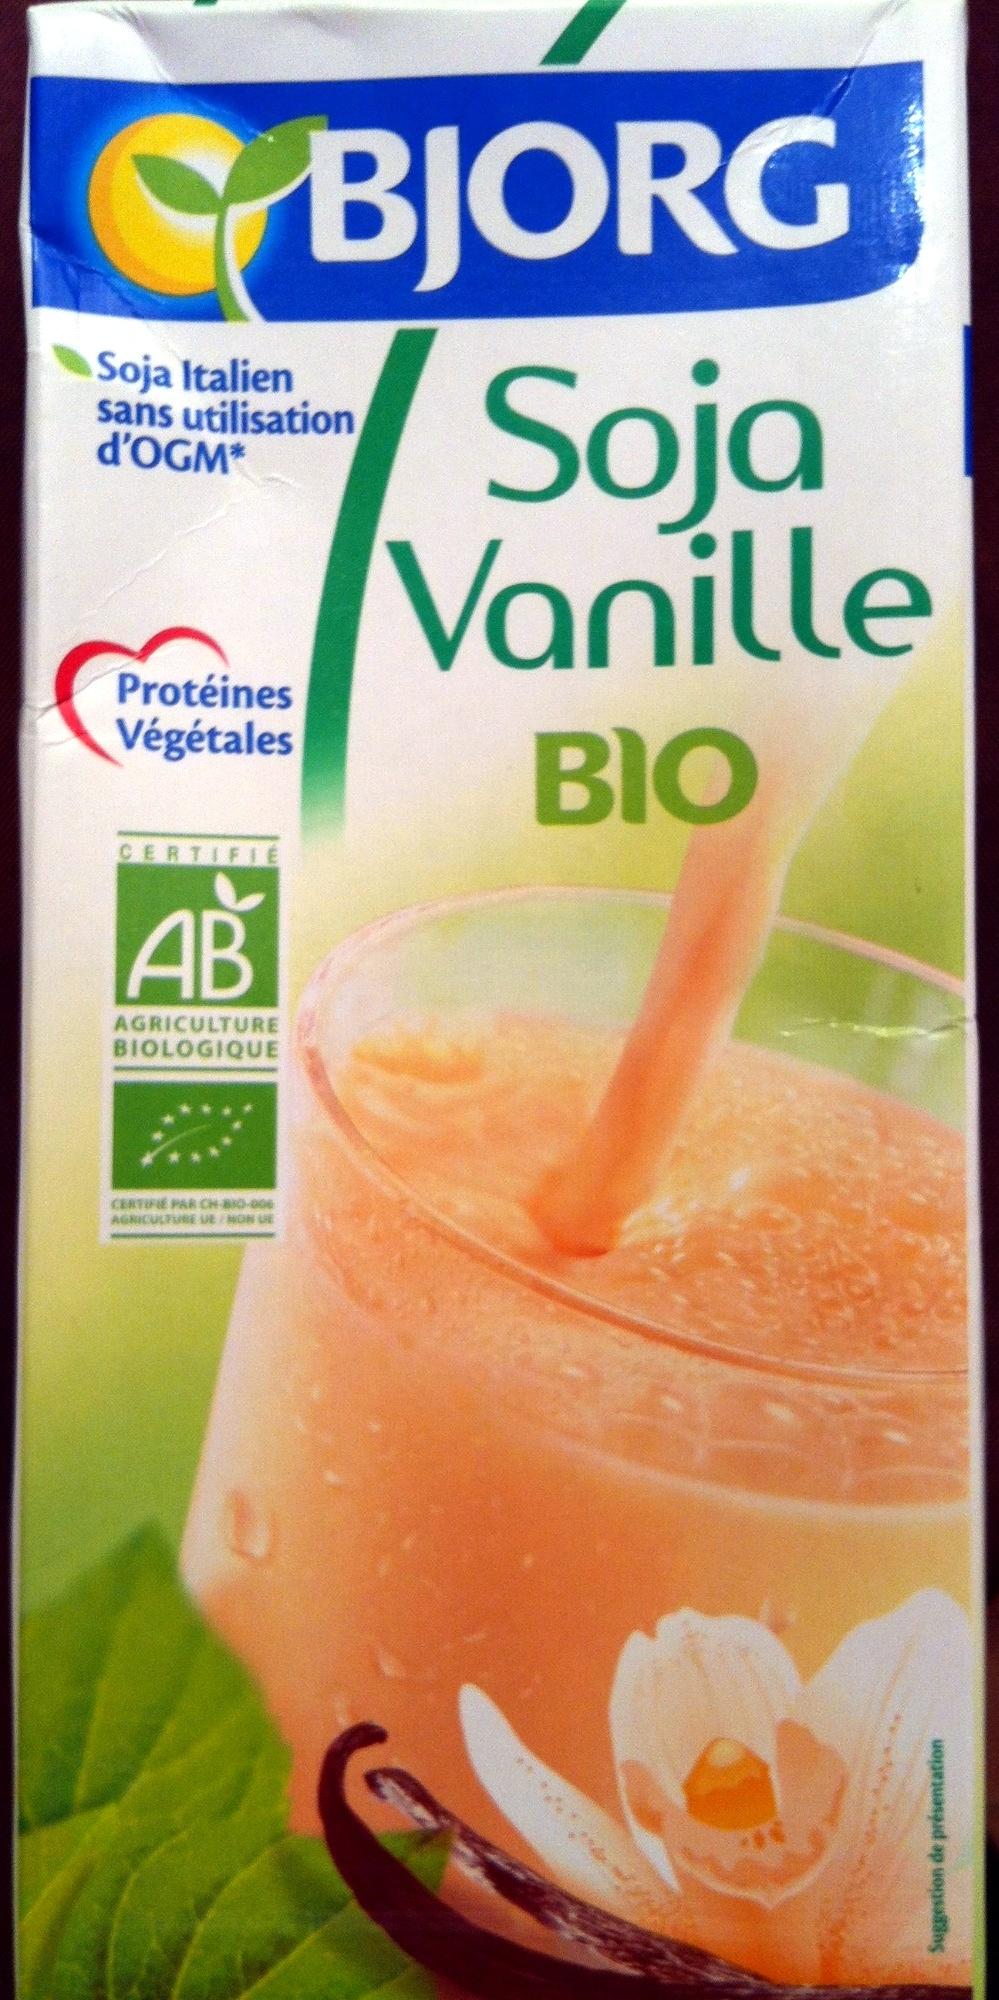 Soja vanille bio bjorg 3 l for Soja cuisine bjorg